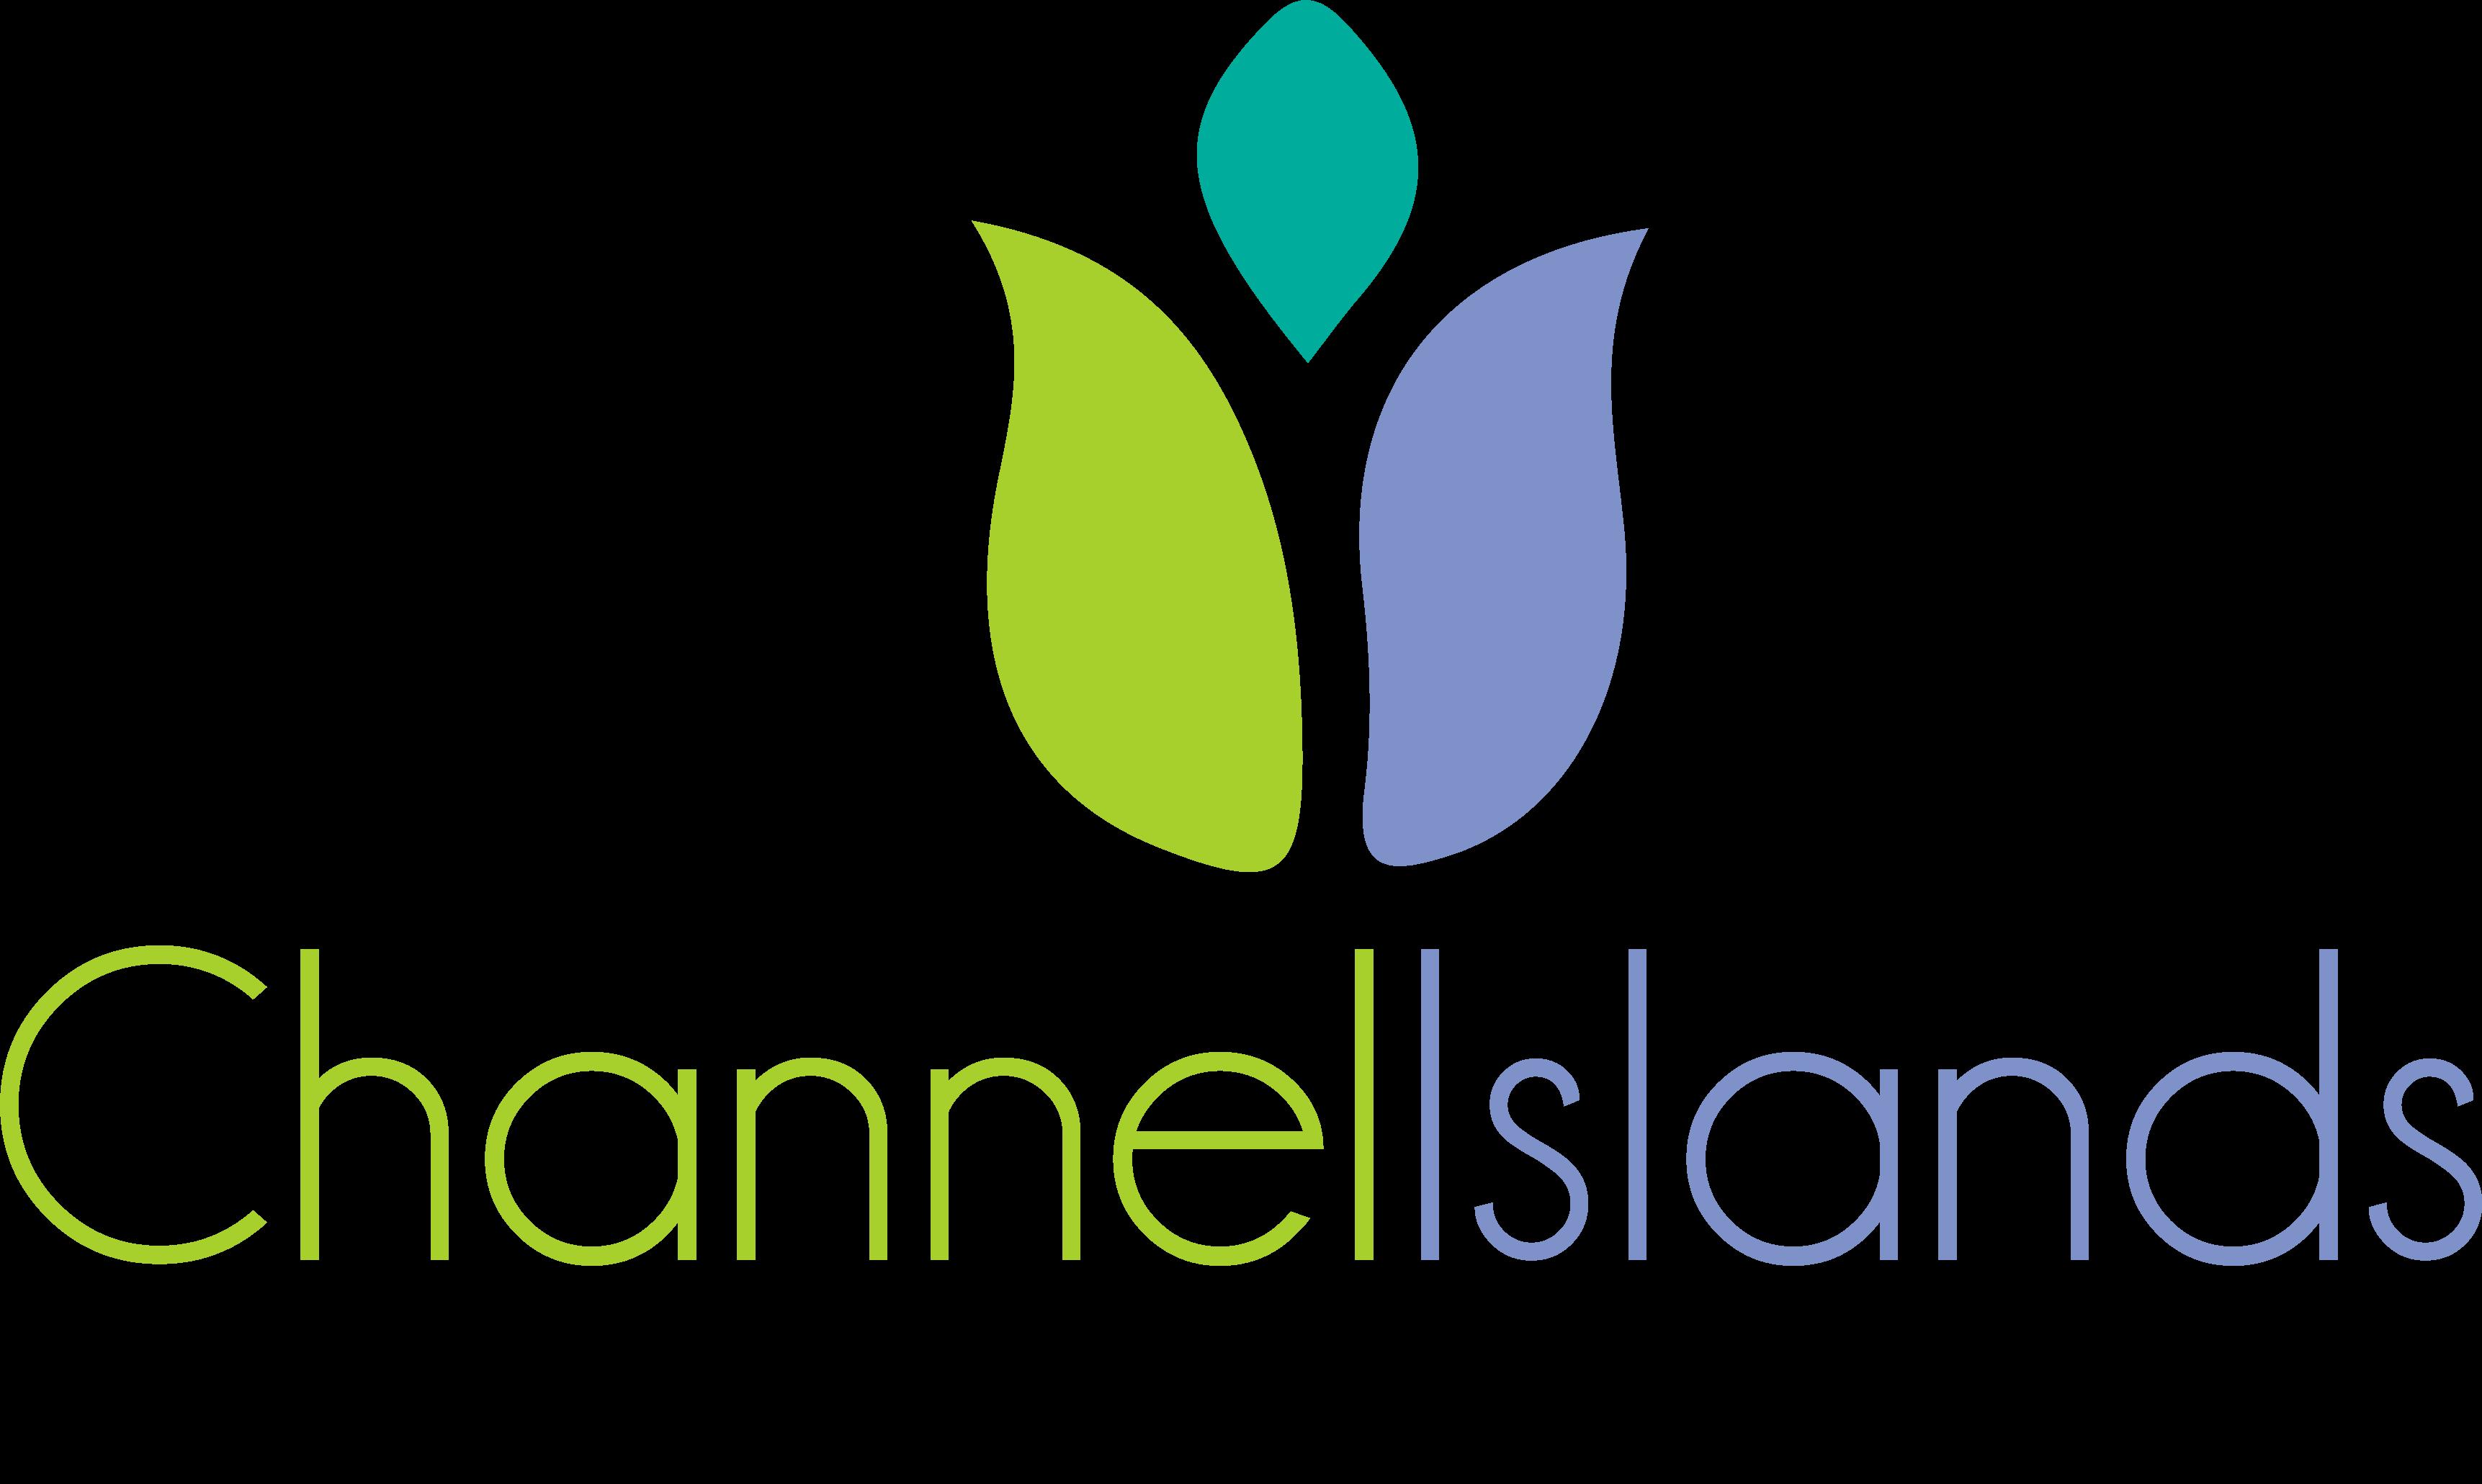 Channel Islands Family Dental Office | Dentist In Ventura County